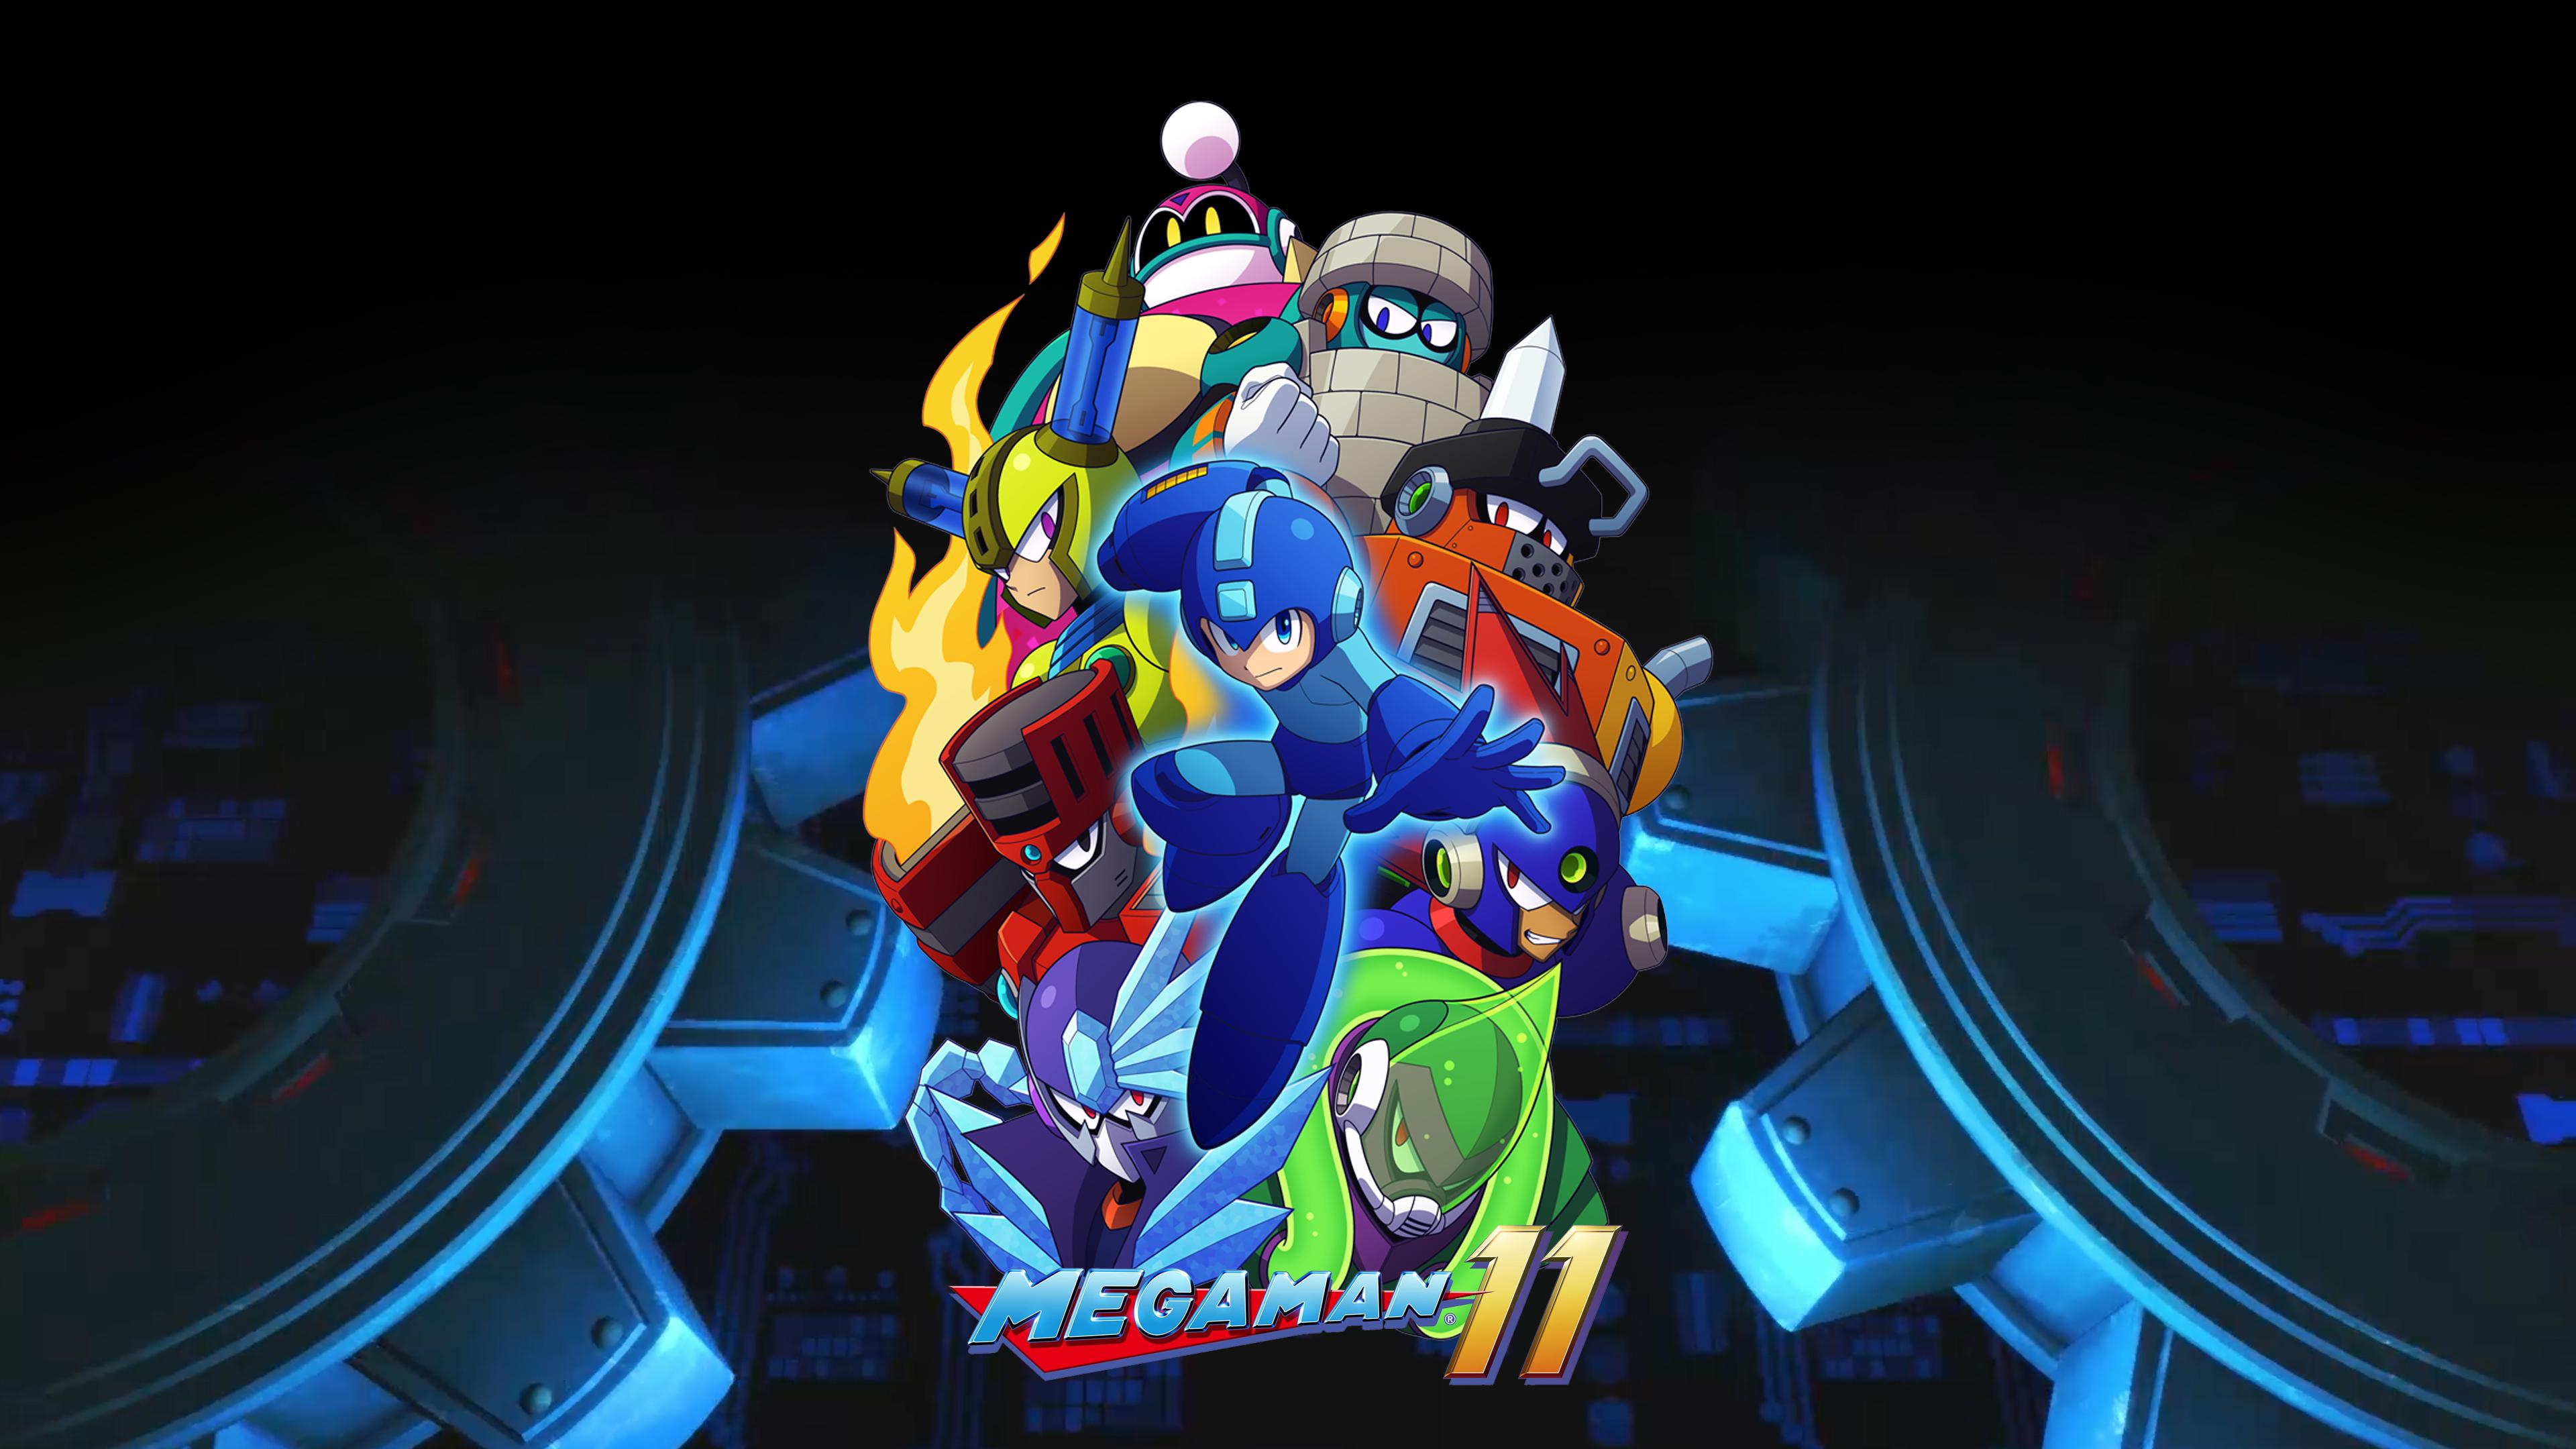 Megaman Smash Bros Wallpaper